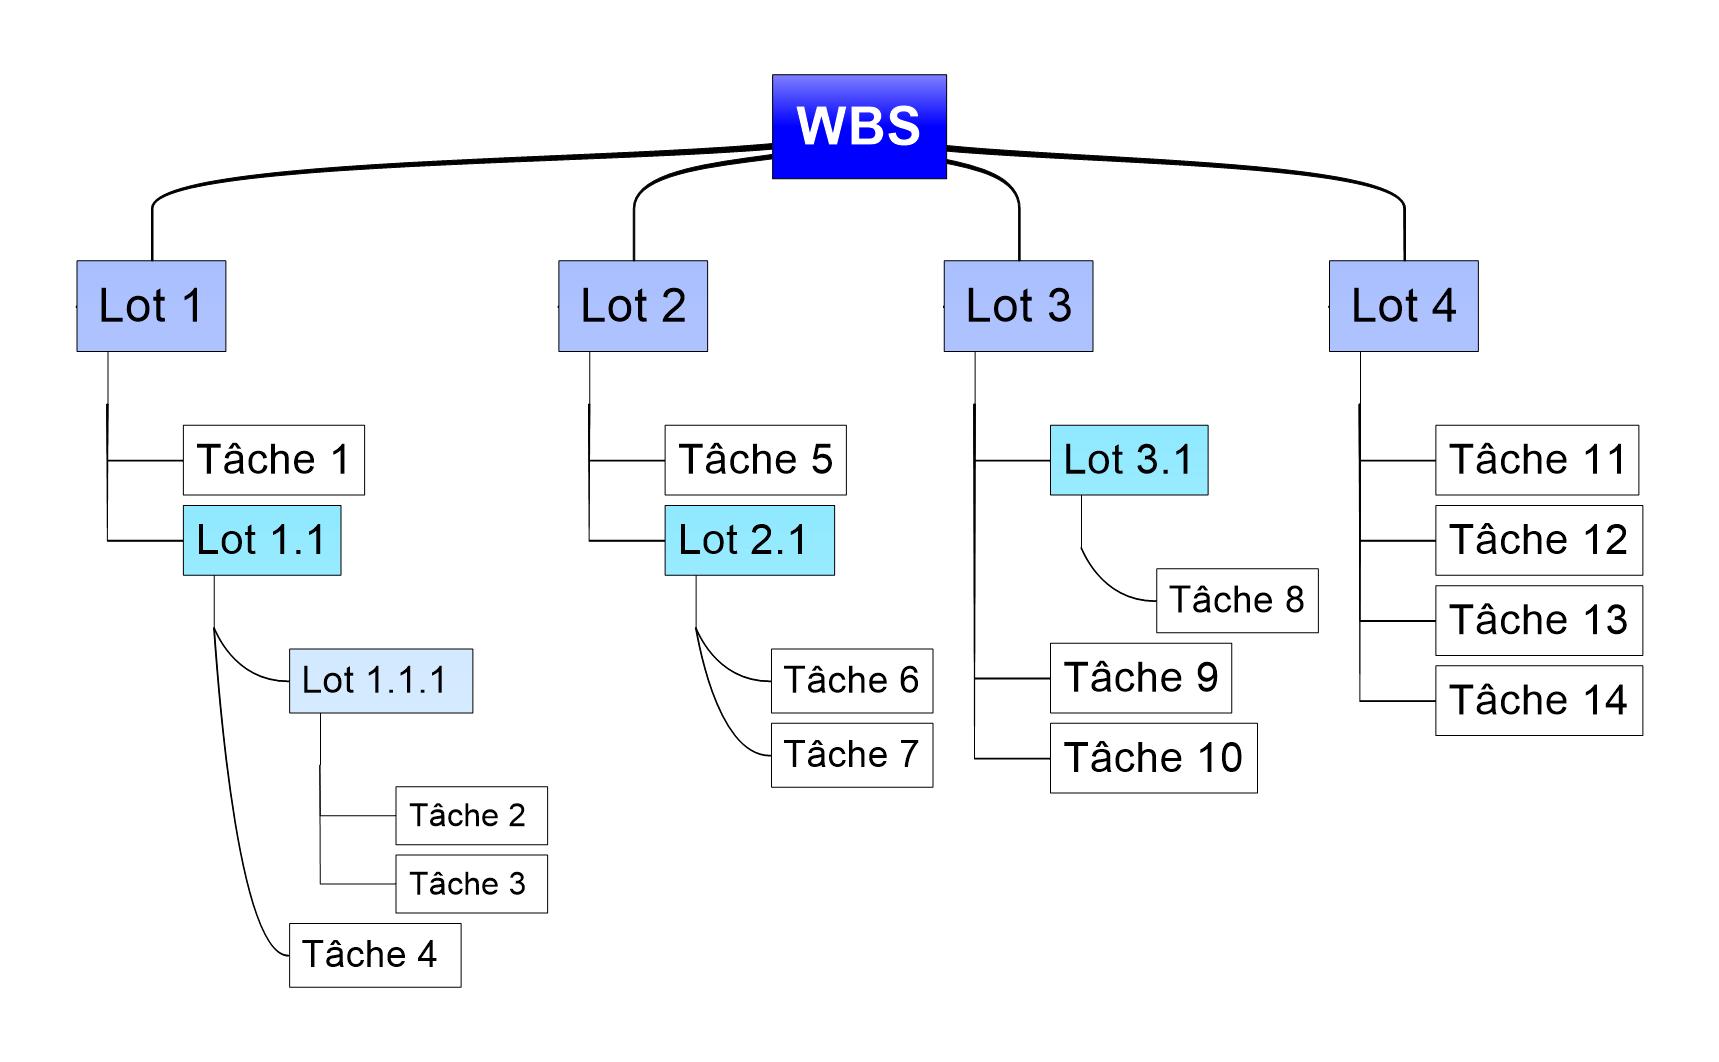 WBS - Work Breakdown Structure - Thierry Secqueville